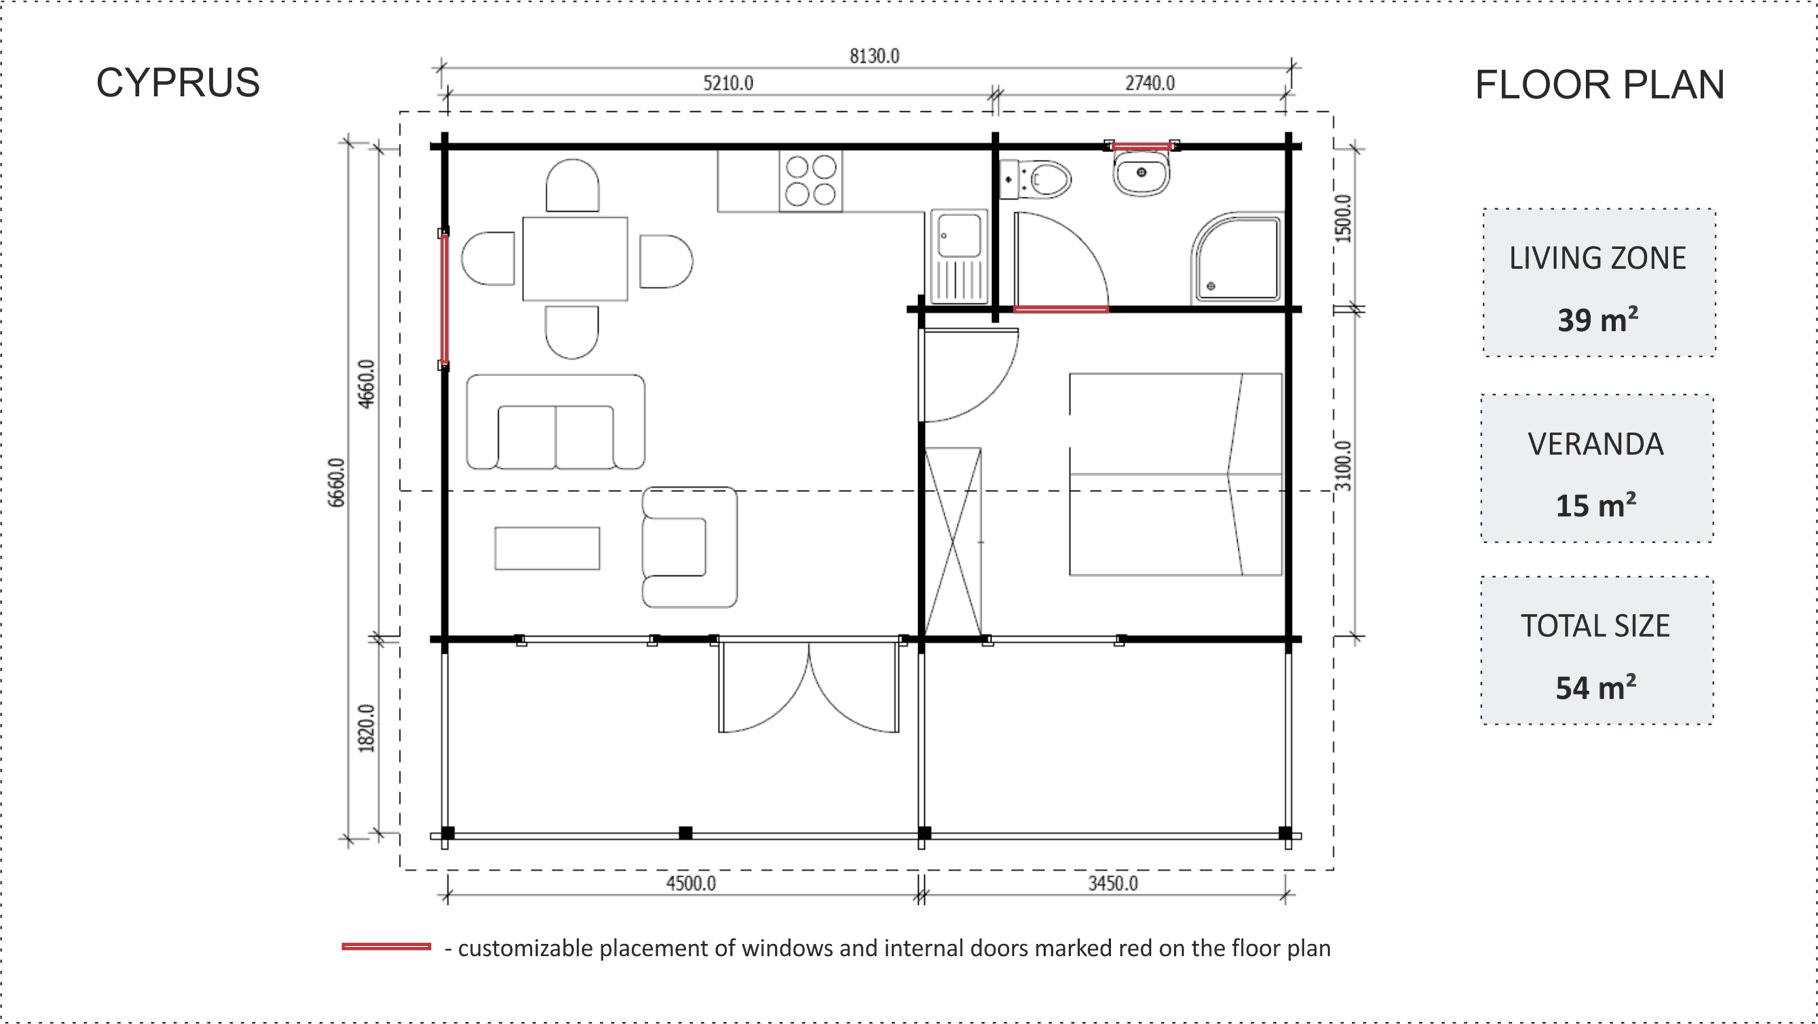 Cyprus - floor plan